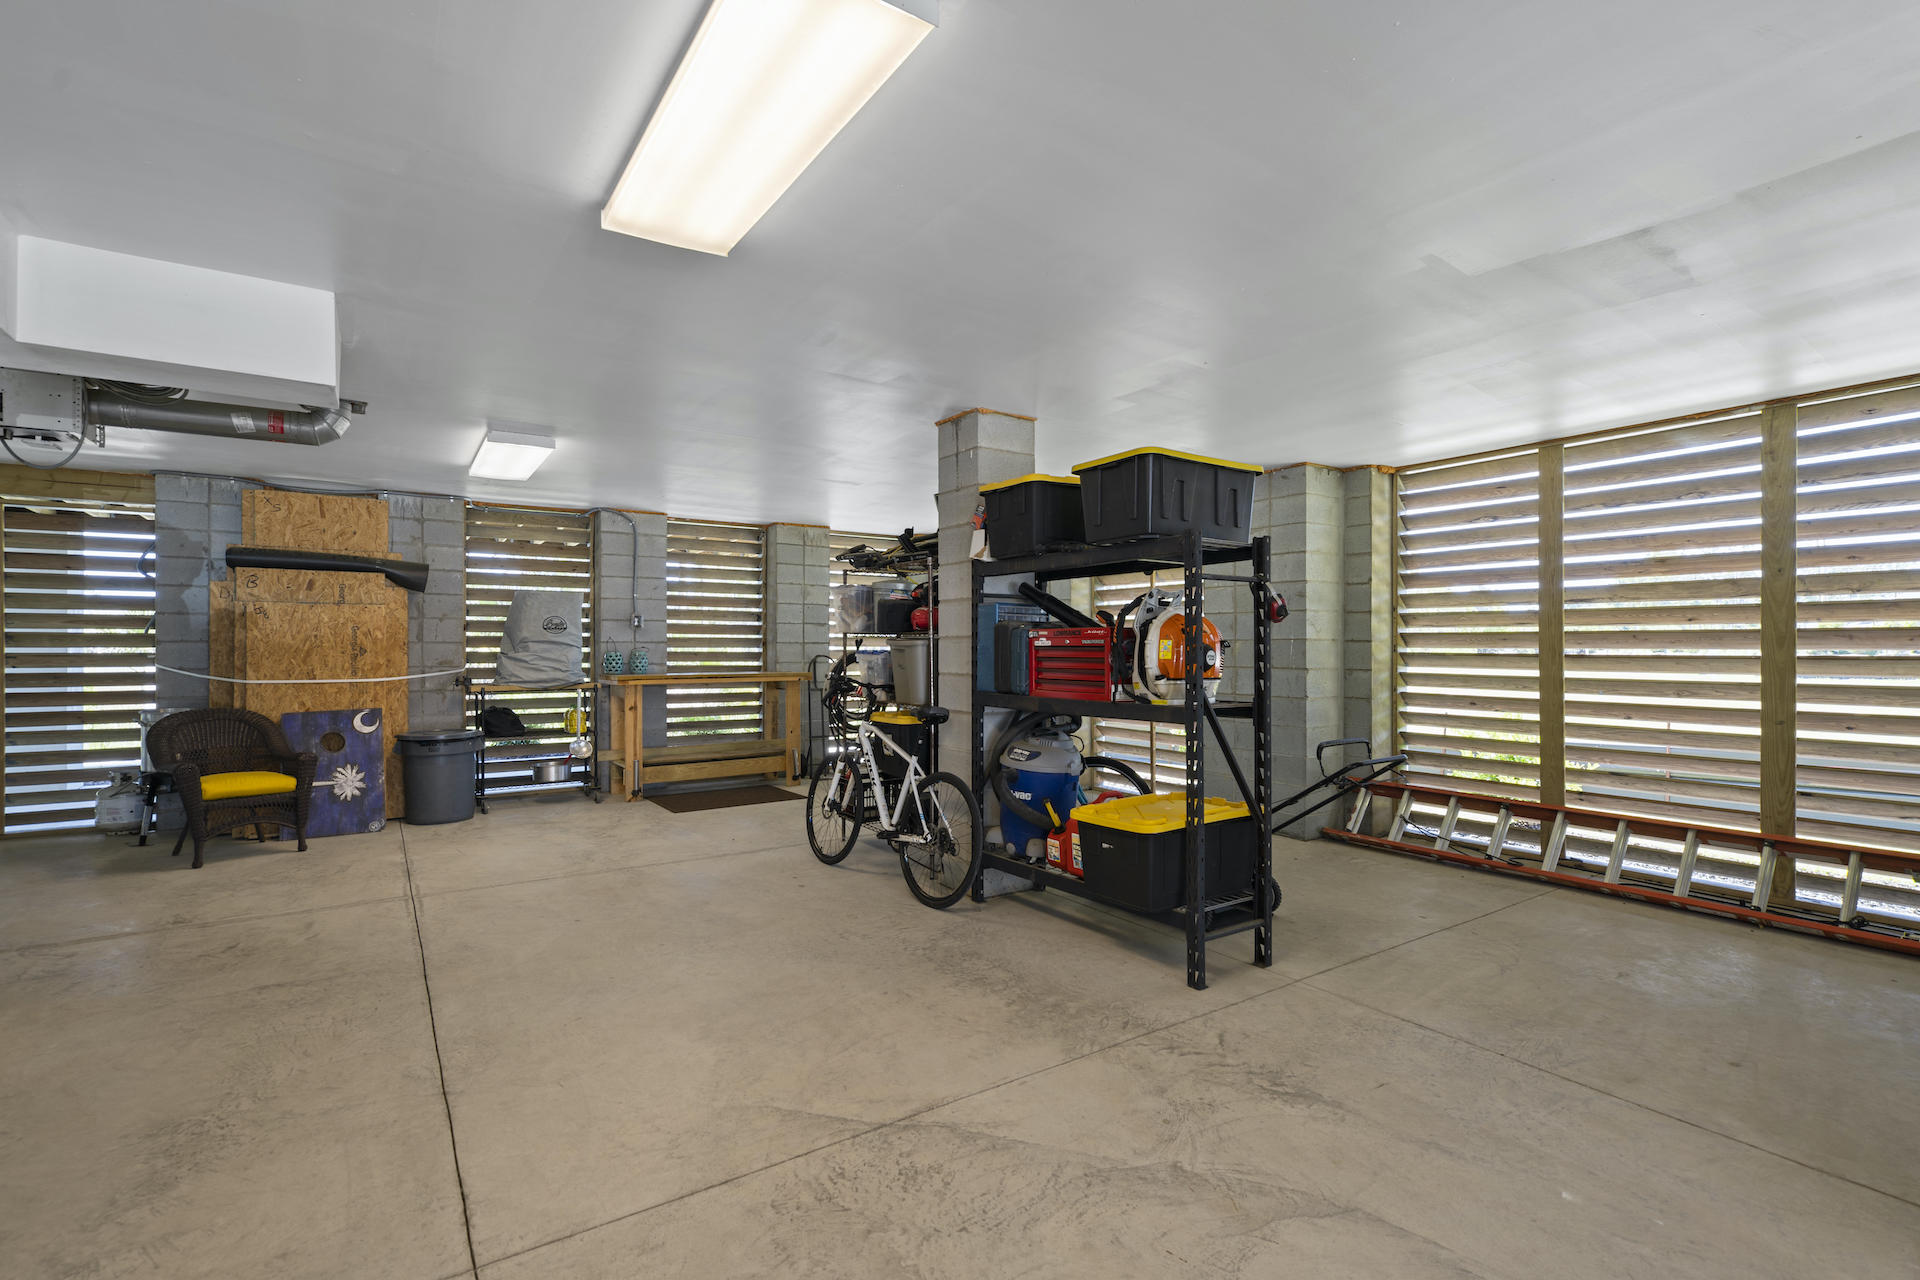 Dunes West Homes For Sale - 2316 Bucktail, Mount Pleasant, SC - 13